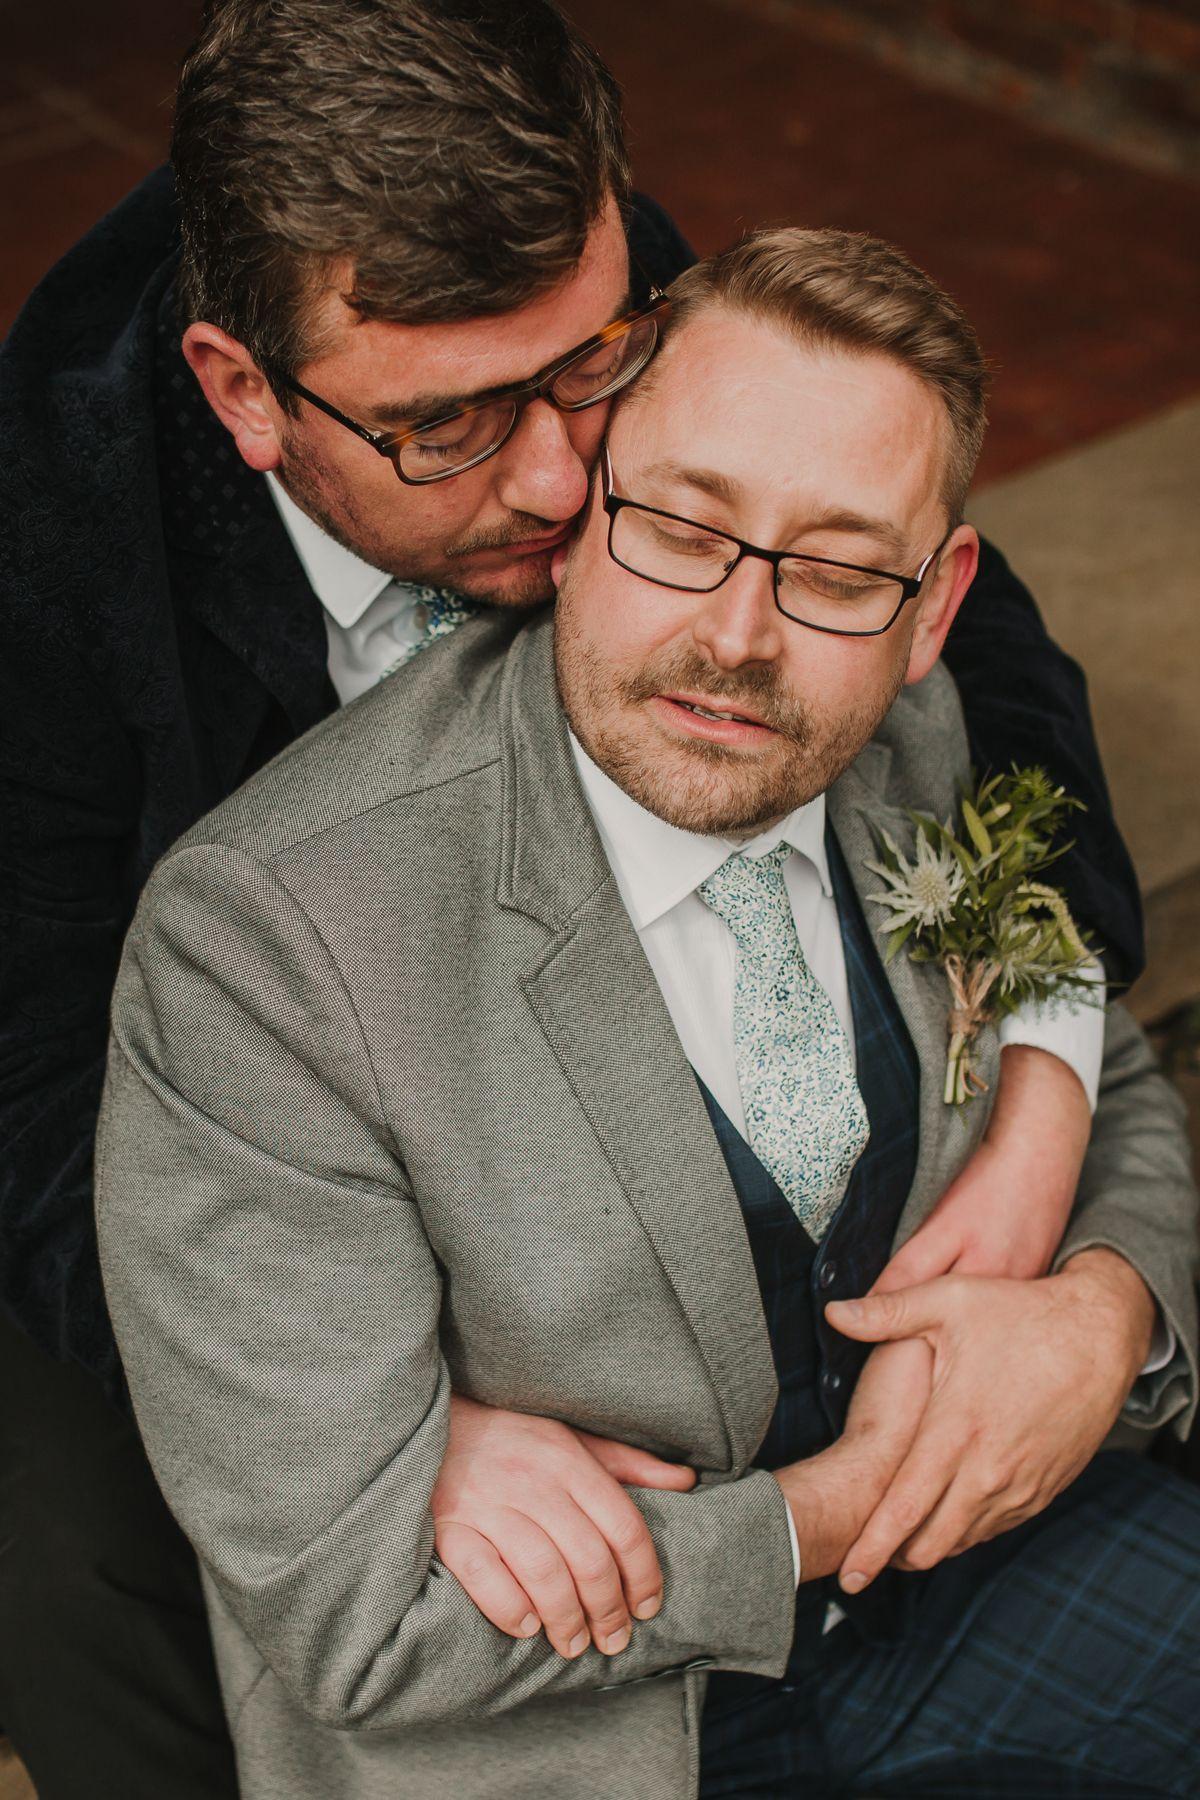 Two grooms same sex wedding